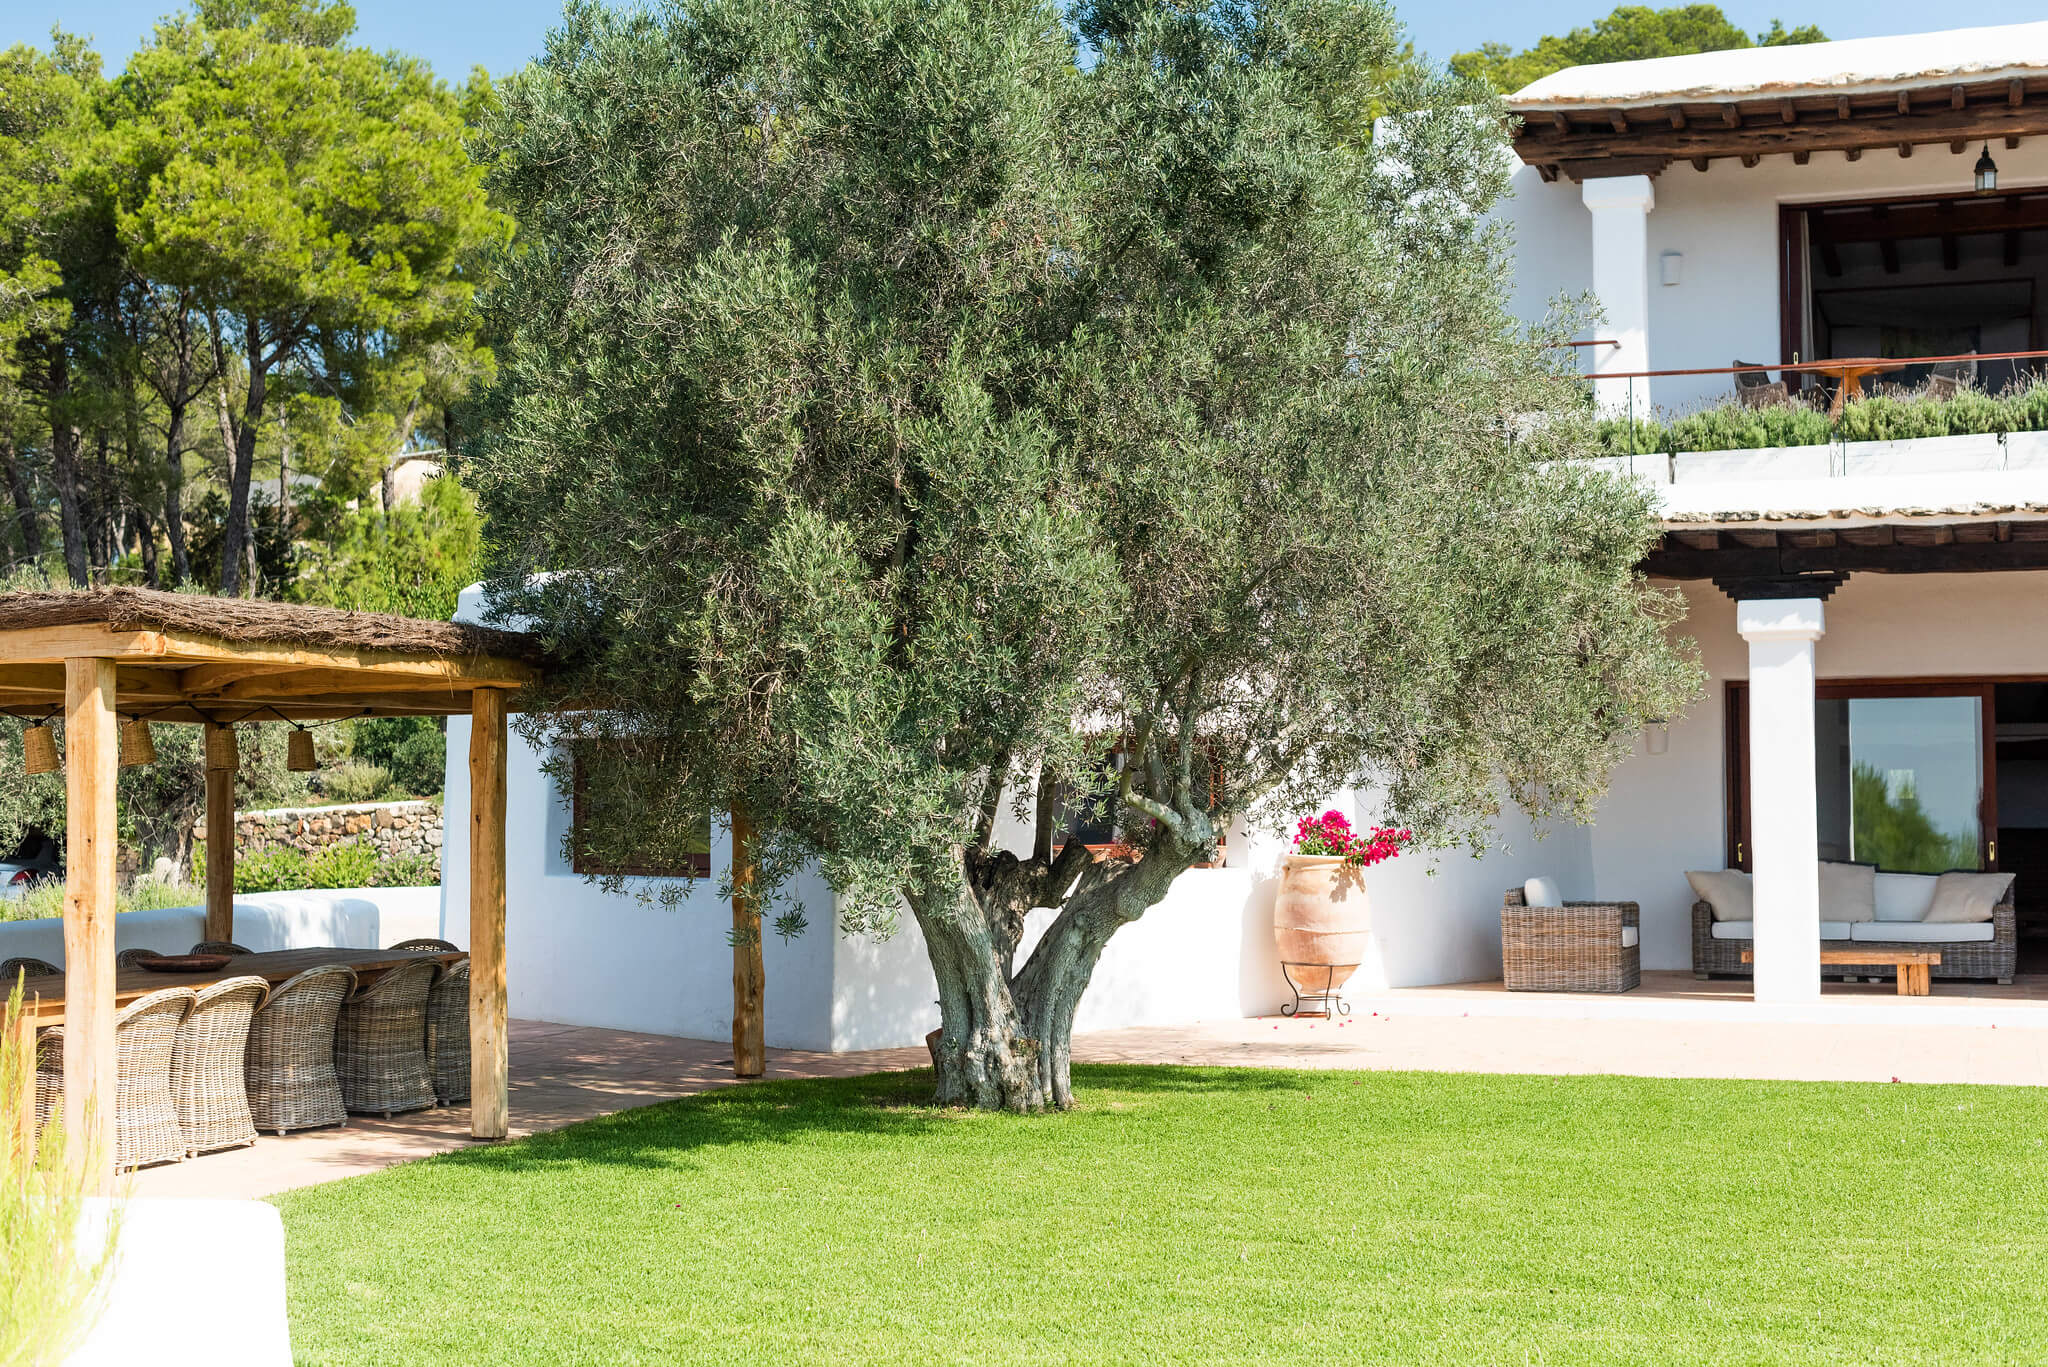 https://www.white-ibiza.com/wp-content/uploads/2020/05/white-ibiza-villas-can-lavanda-olive-tree.jpg